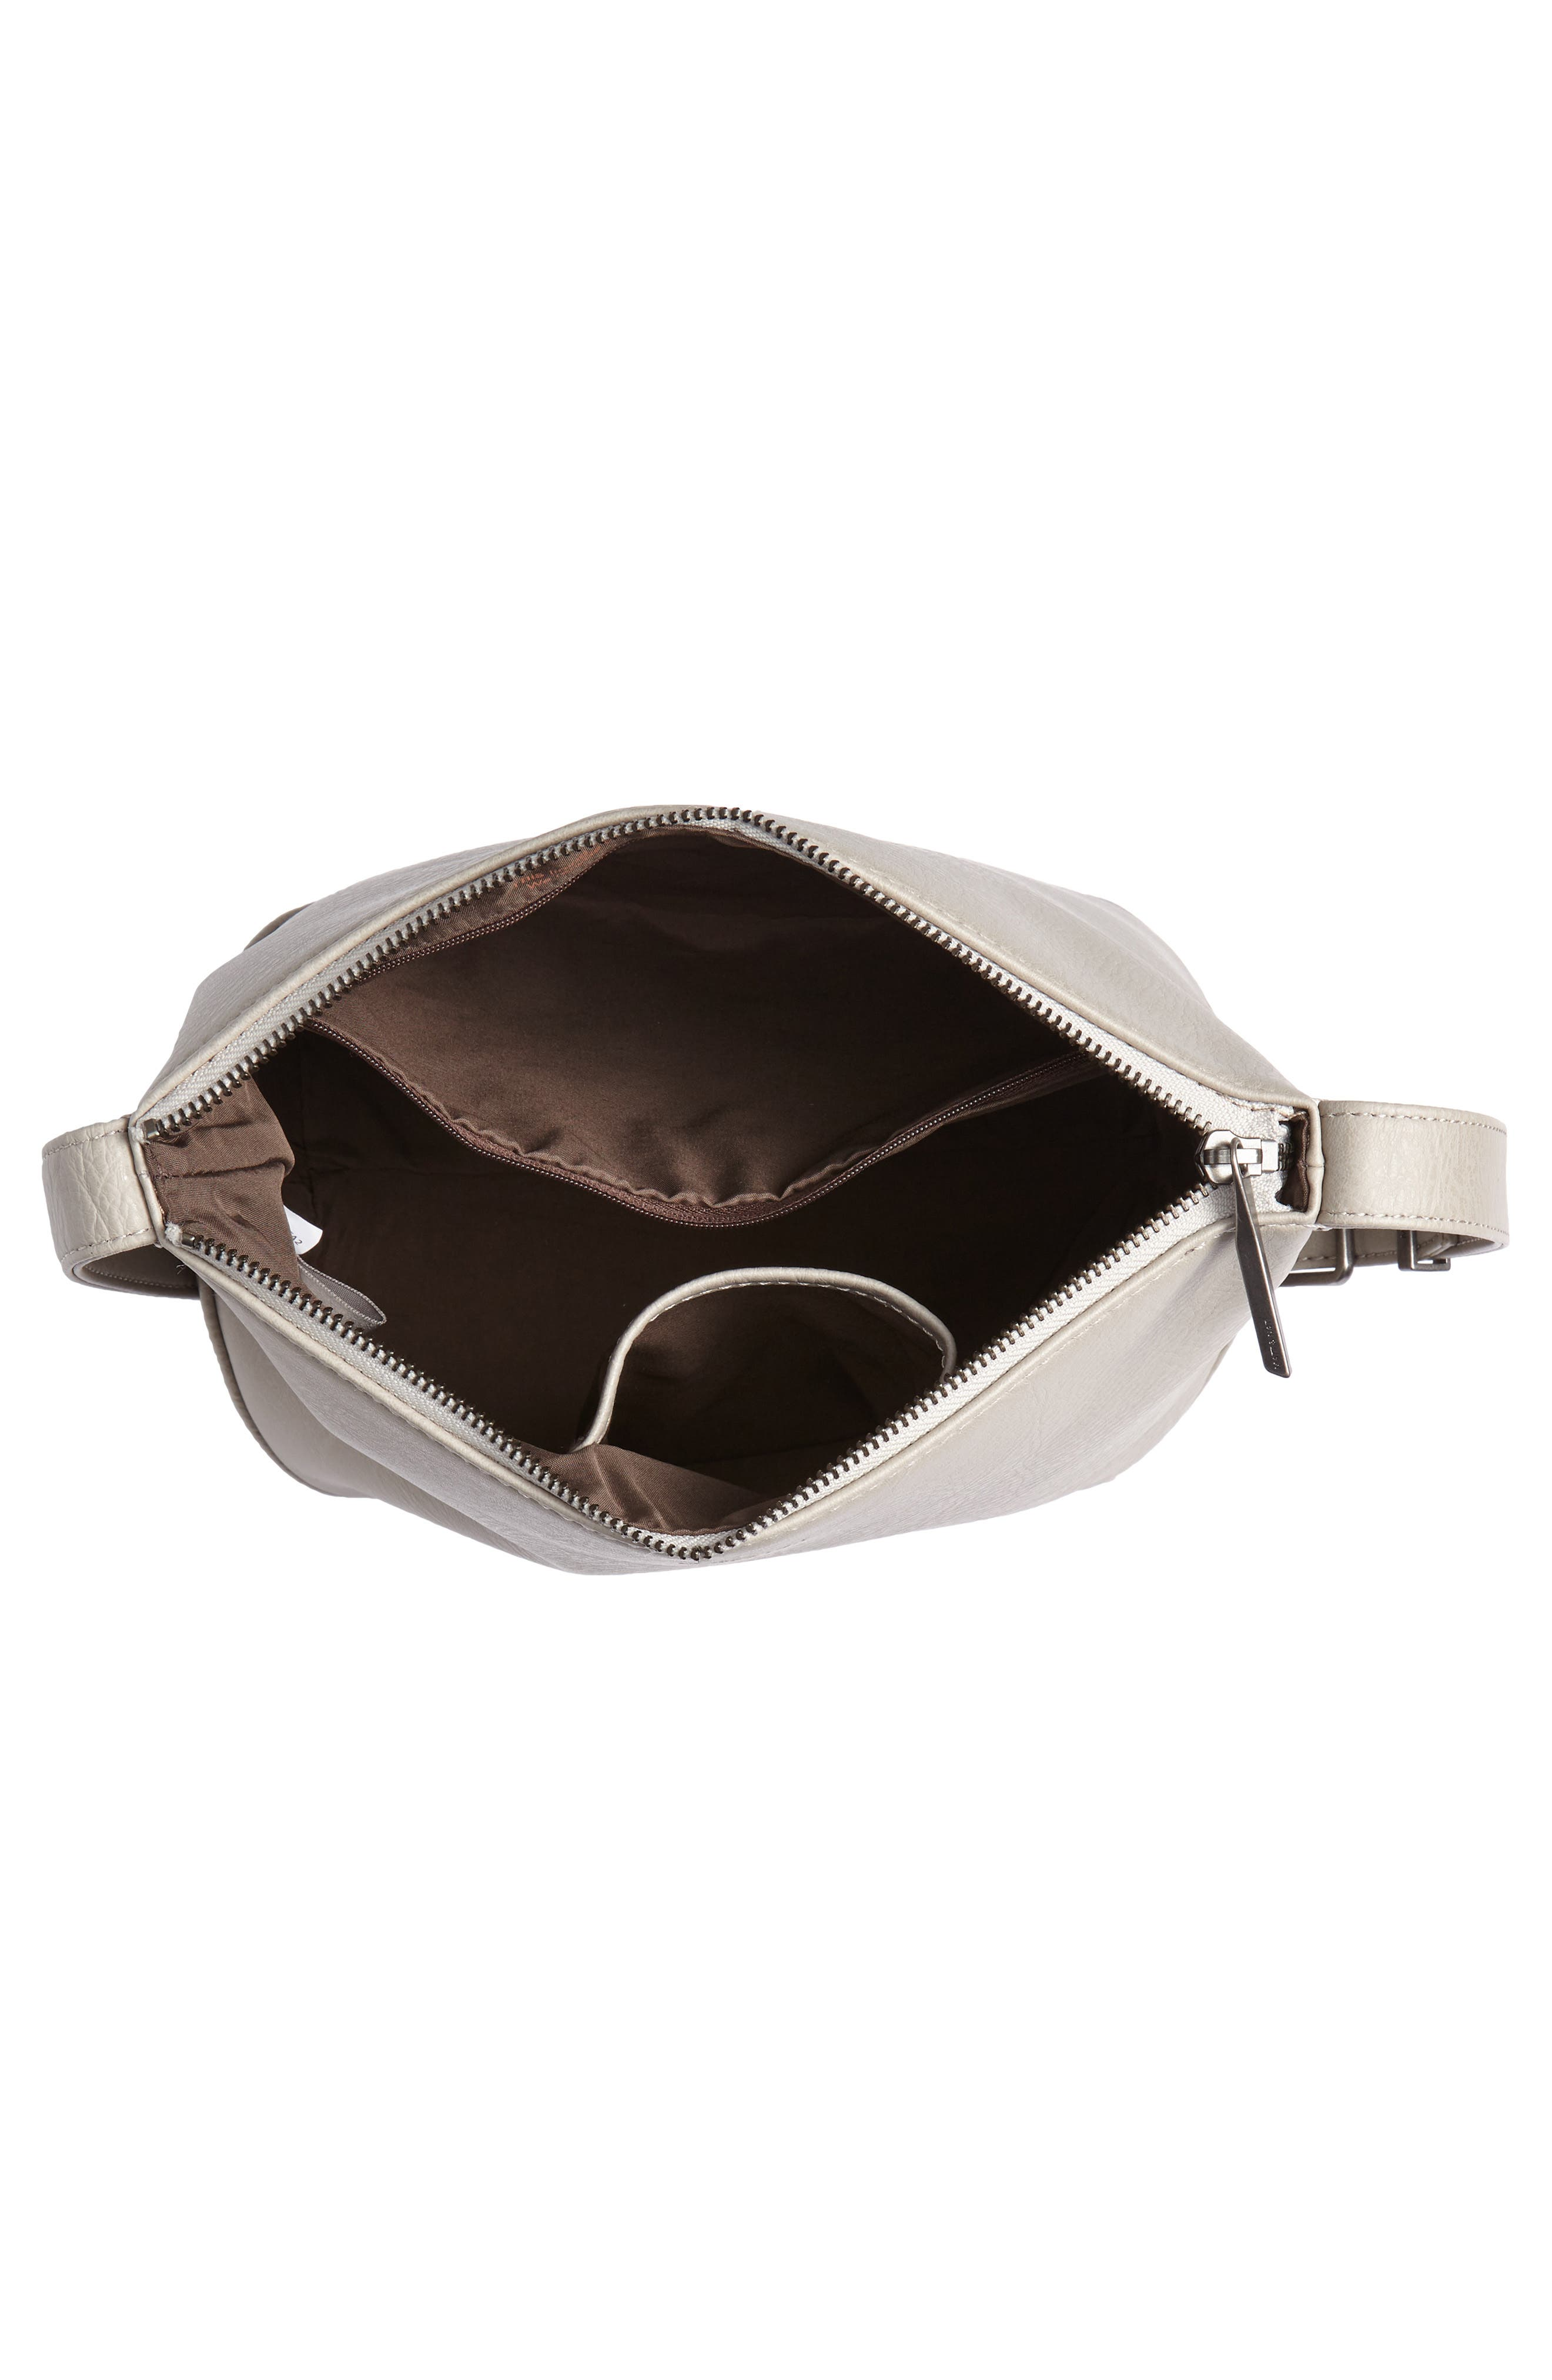 Large Sam Faux Leather Crossbody Bag,                             Alternate thumbnail 4, color,                             050